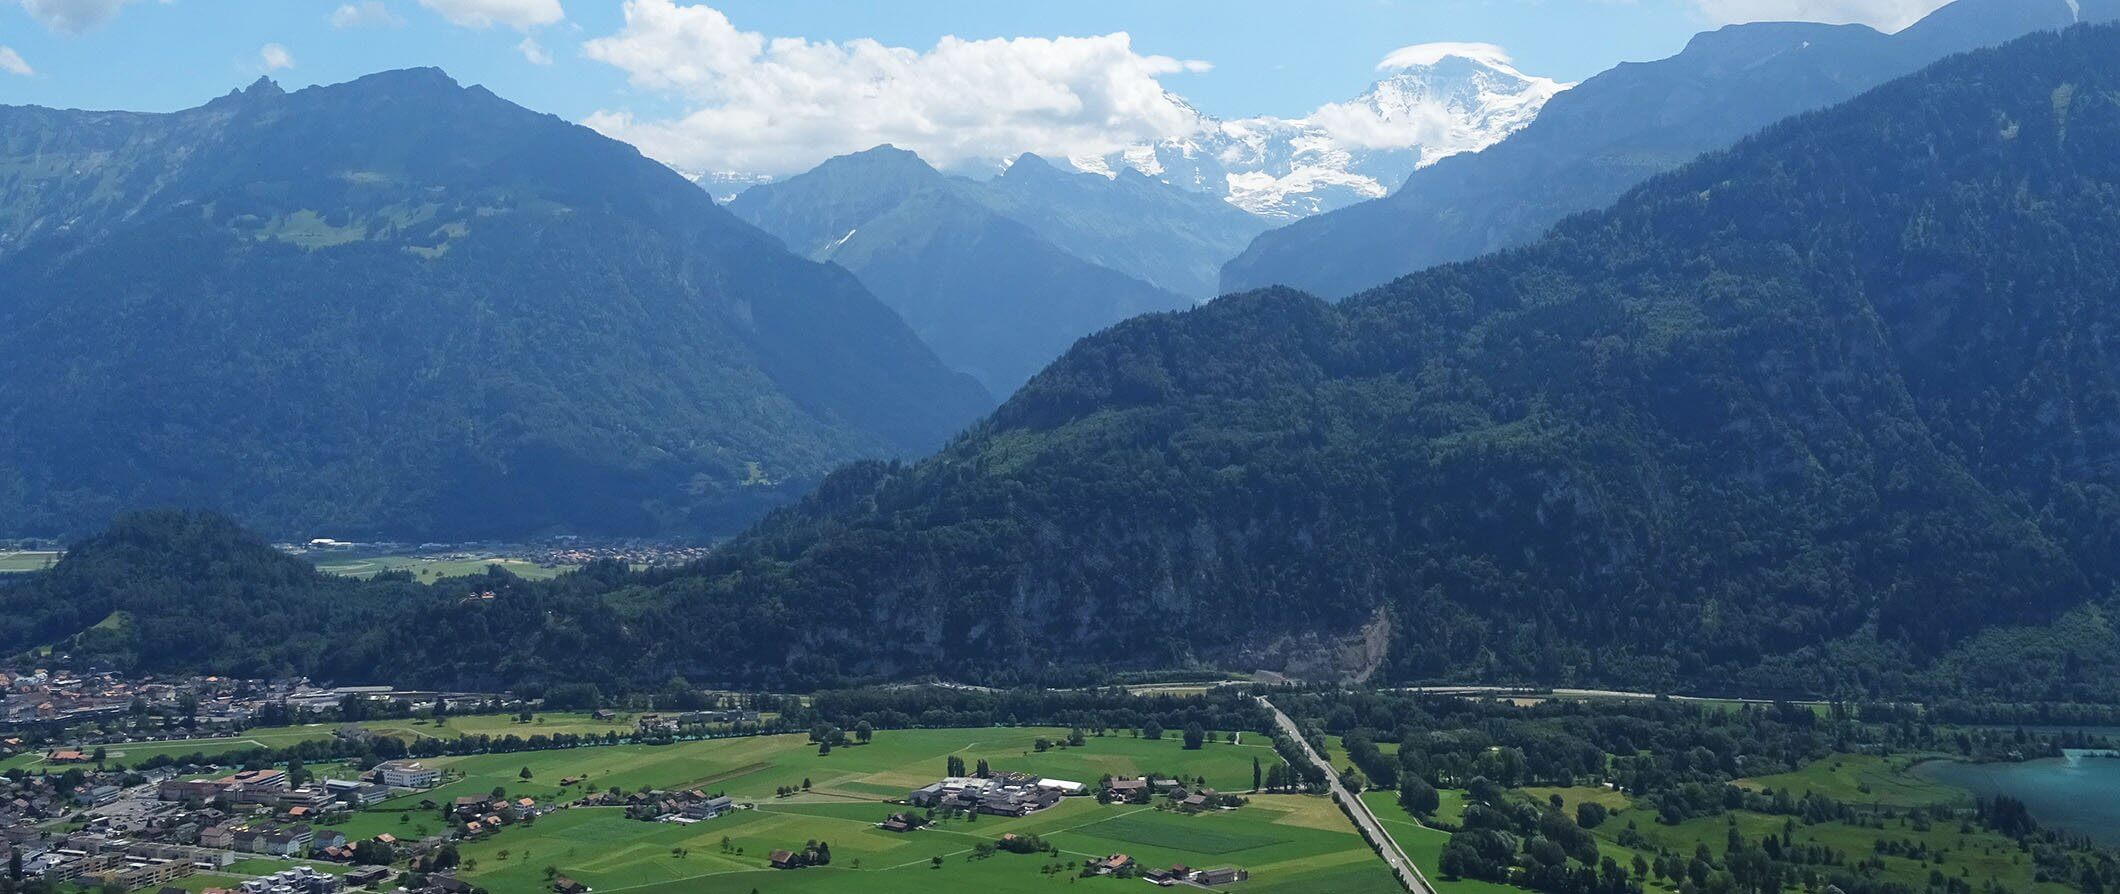 Cheap Insurance Companies >> Interlaken Travel Guide